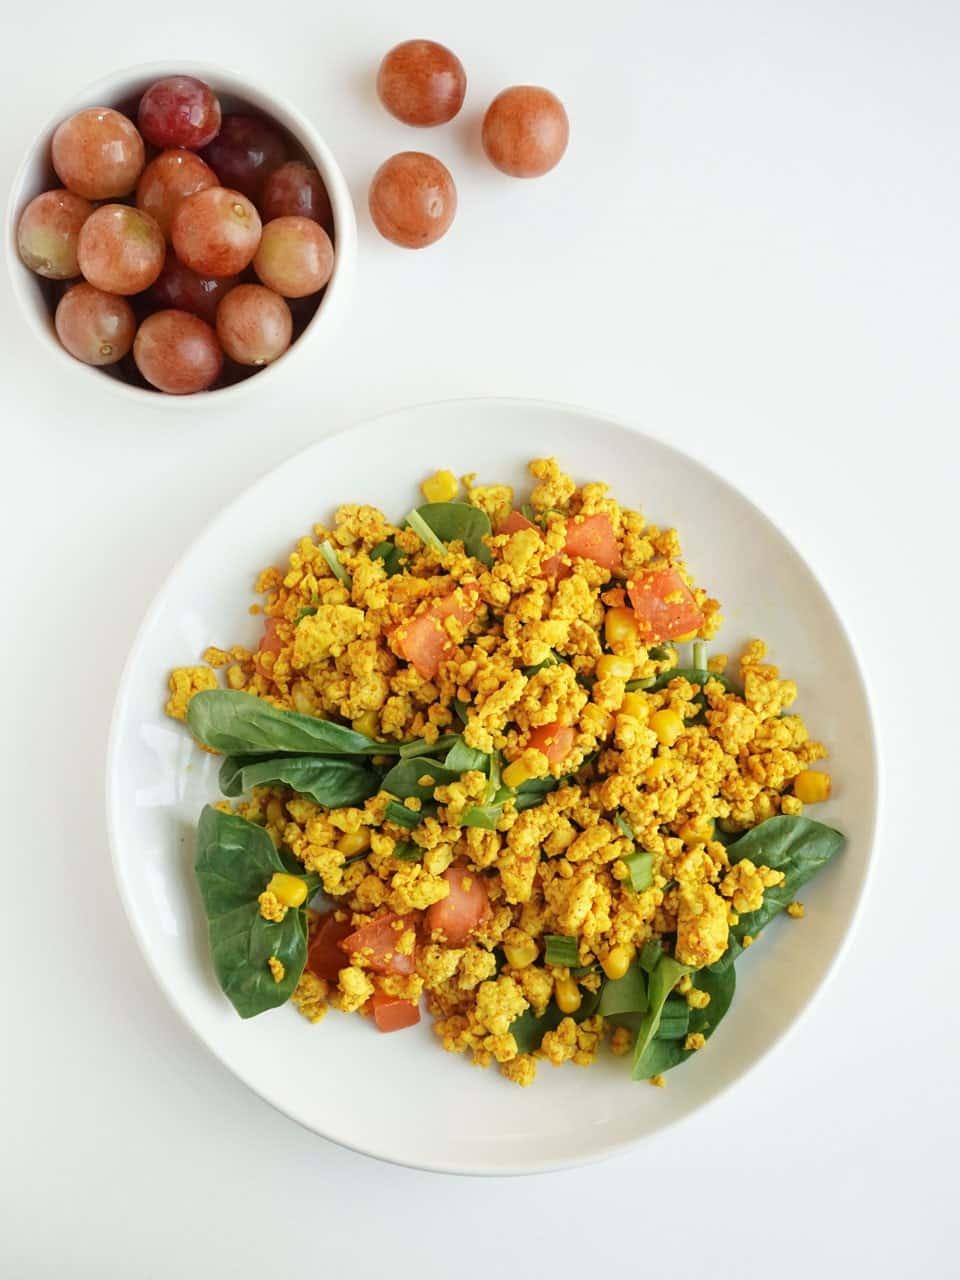 49 Savory Vegan Breakfast Recipes: Simple Vegan Tofu Scramble with Corn